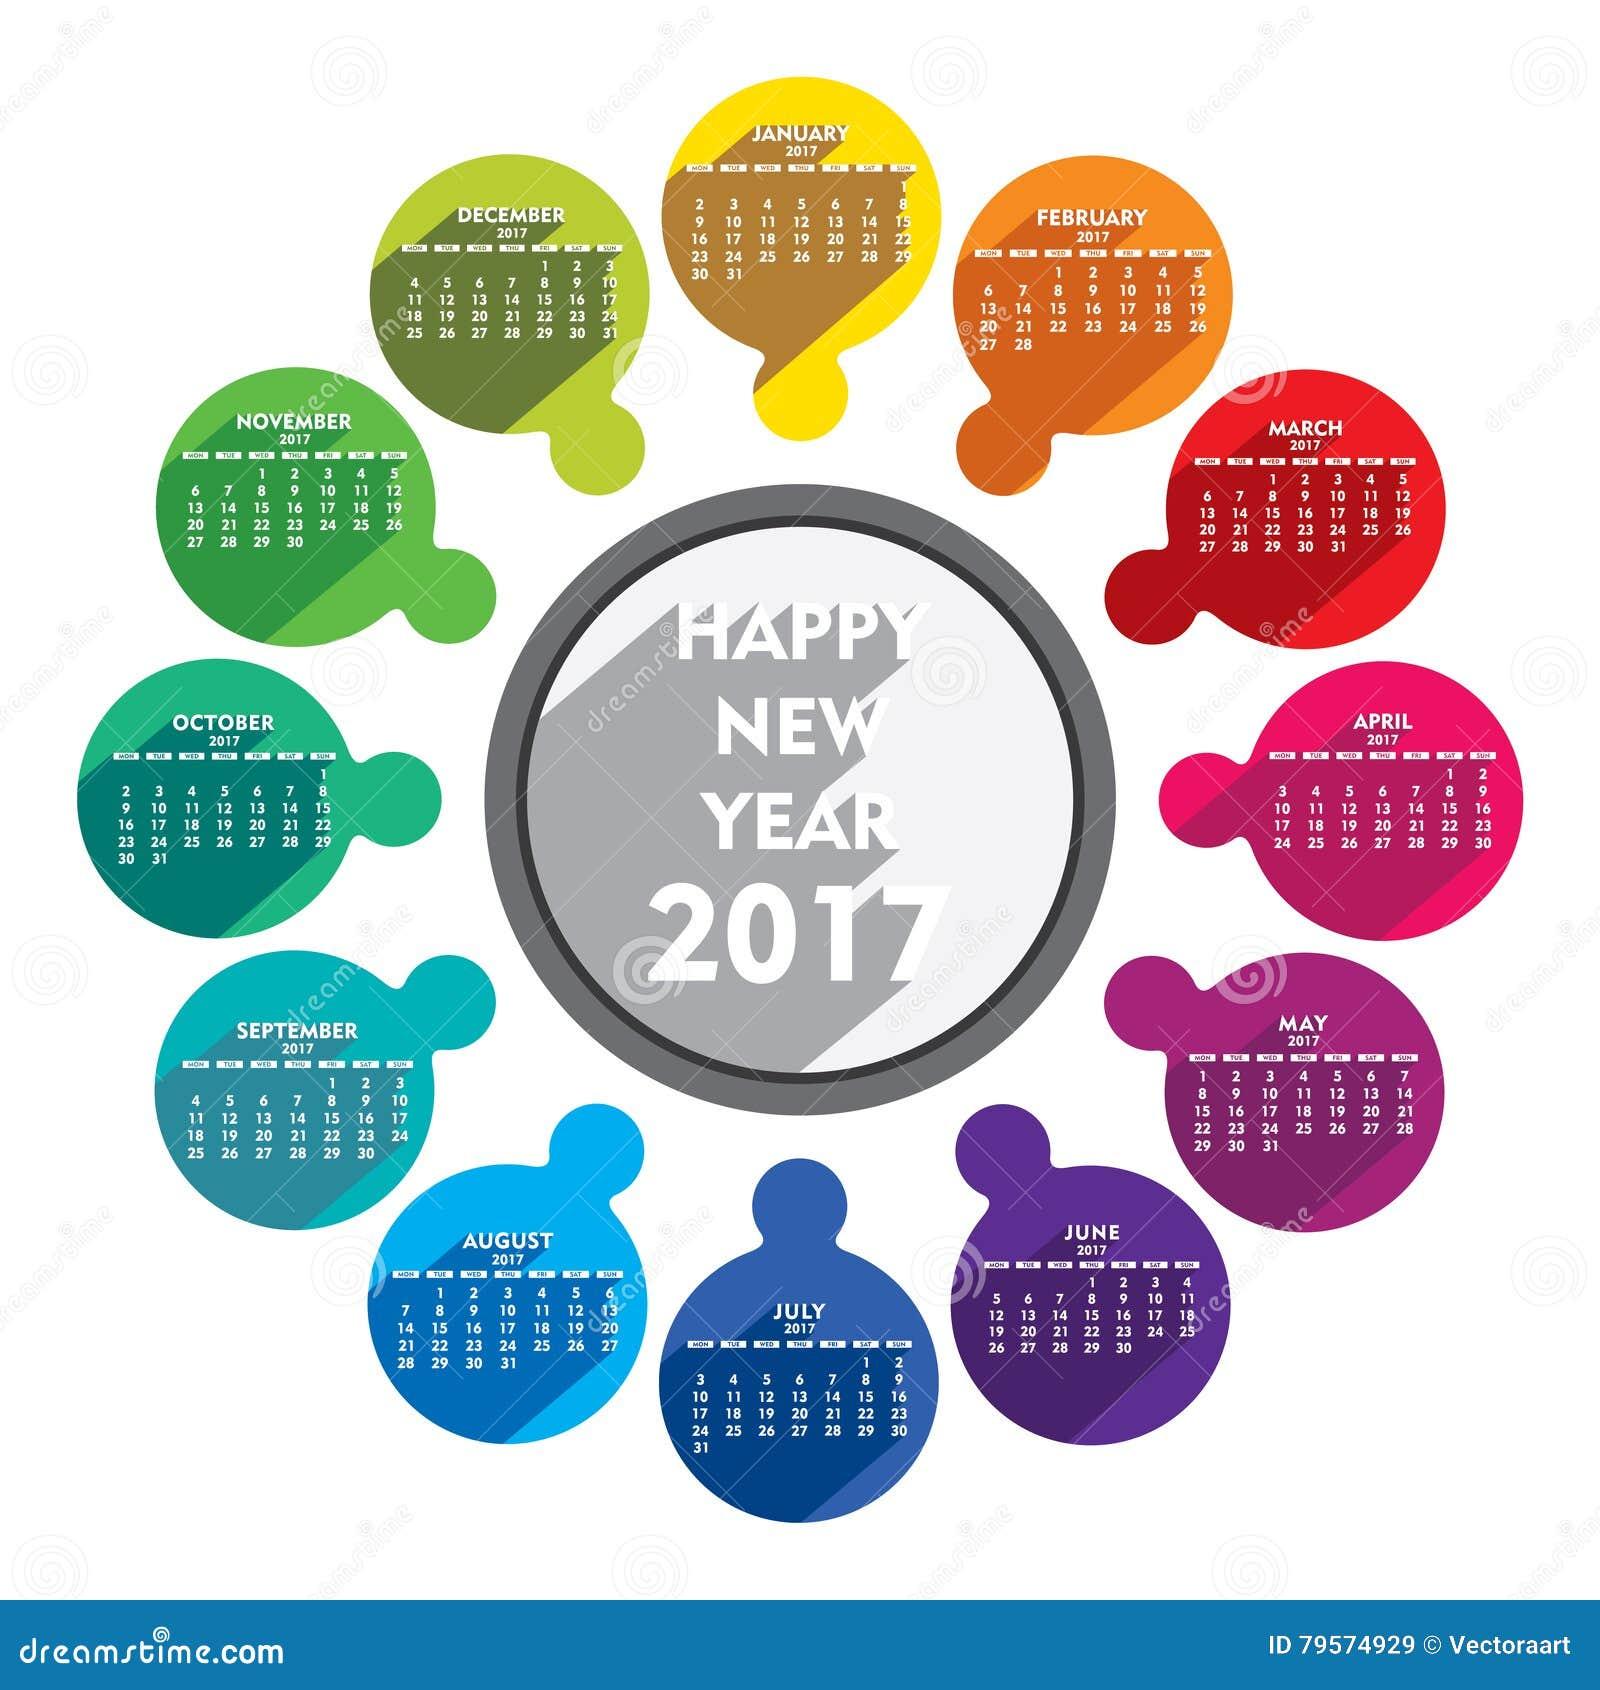 New Year Calendar Designs : Happy new year calendar design stock vector image